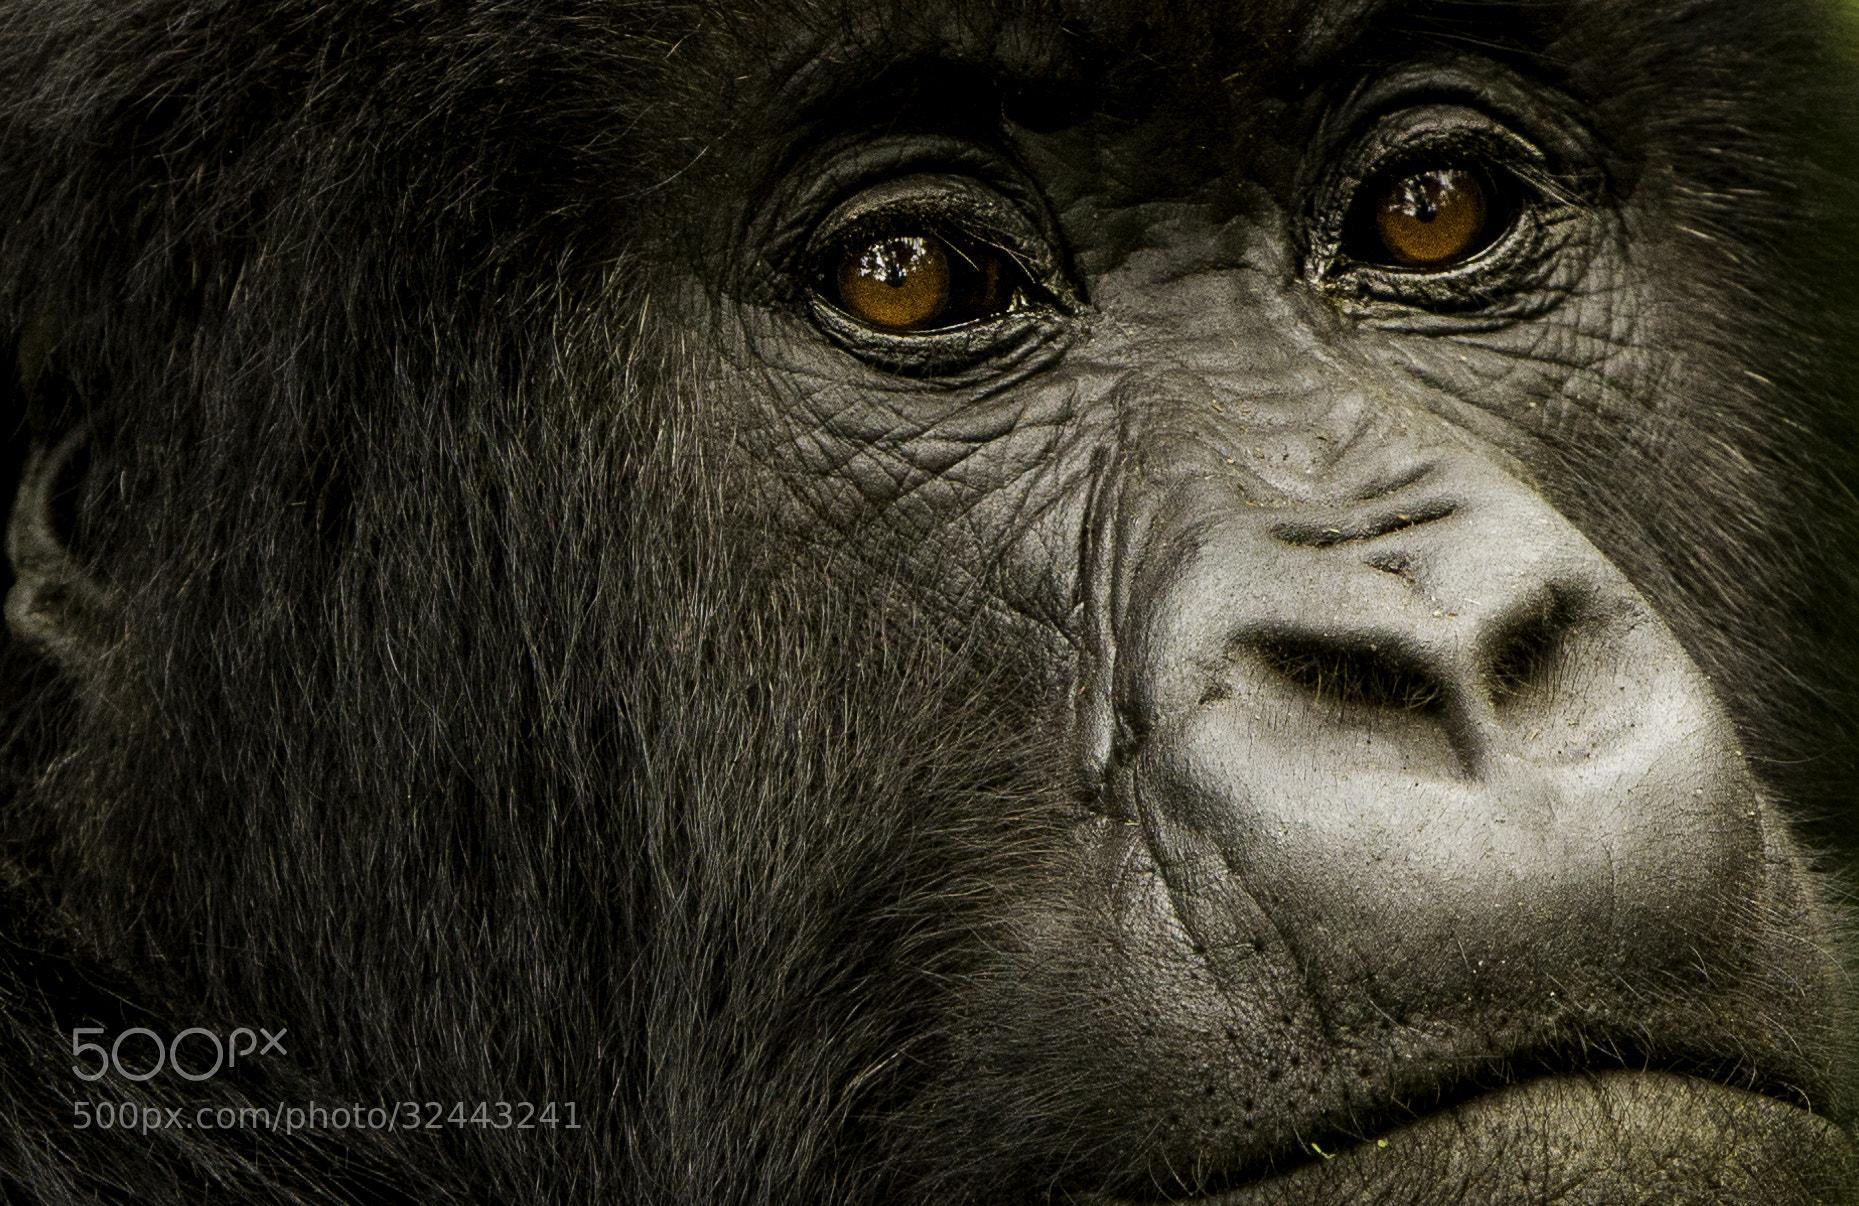 Photograph The Look by Batu Berkok on 500px